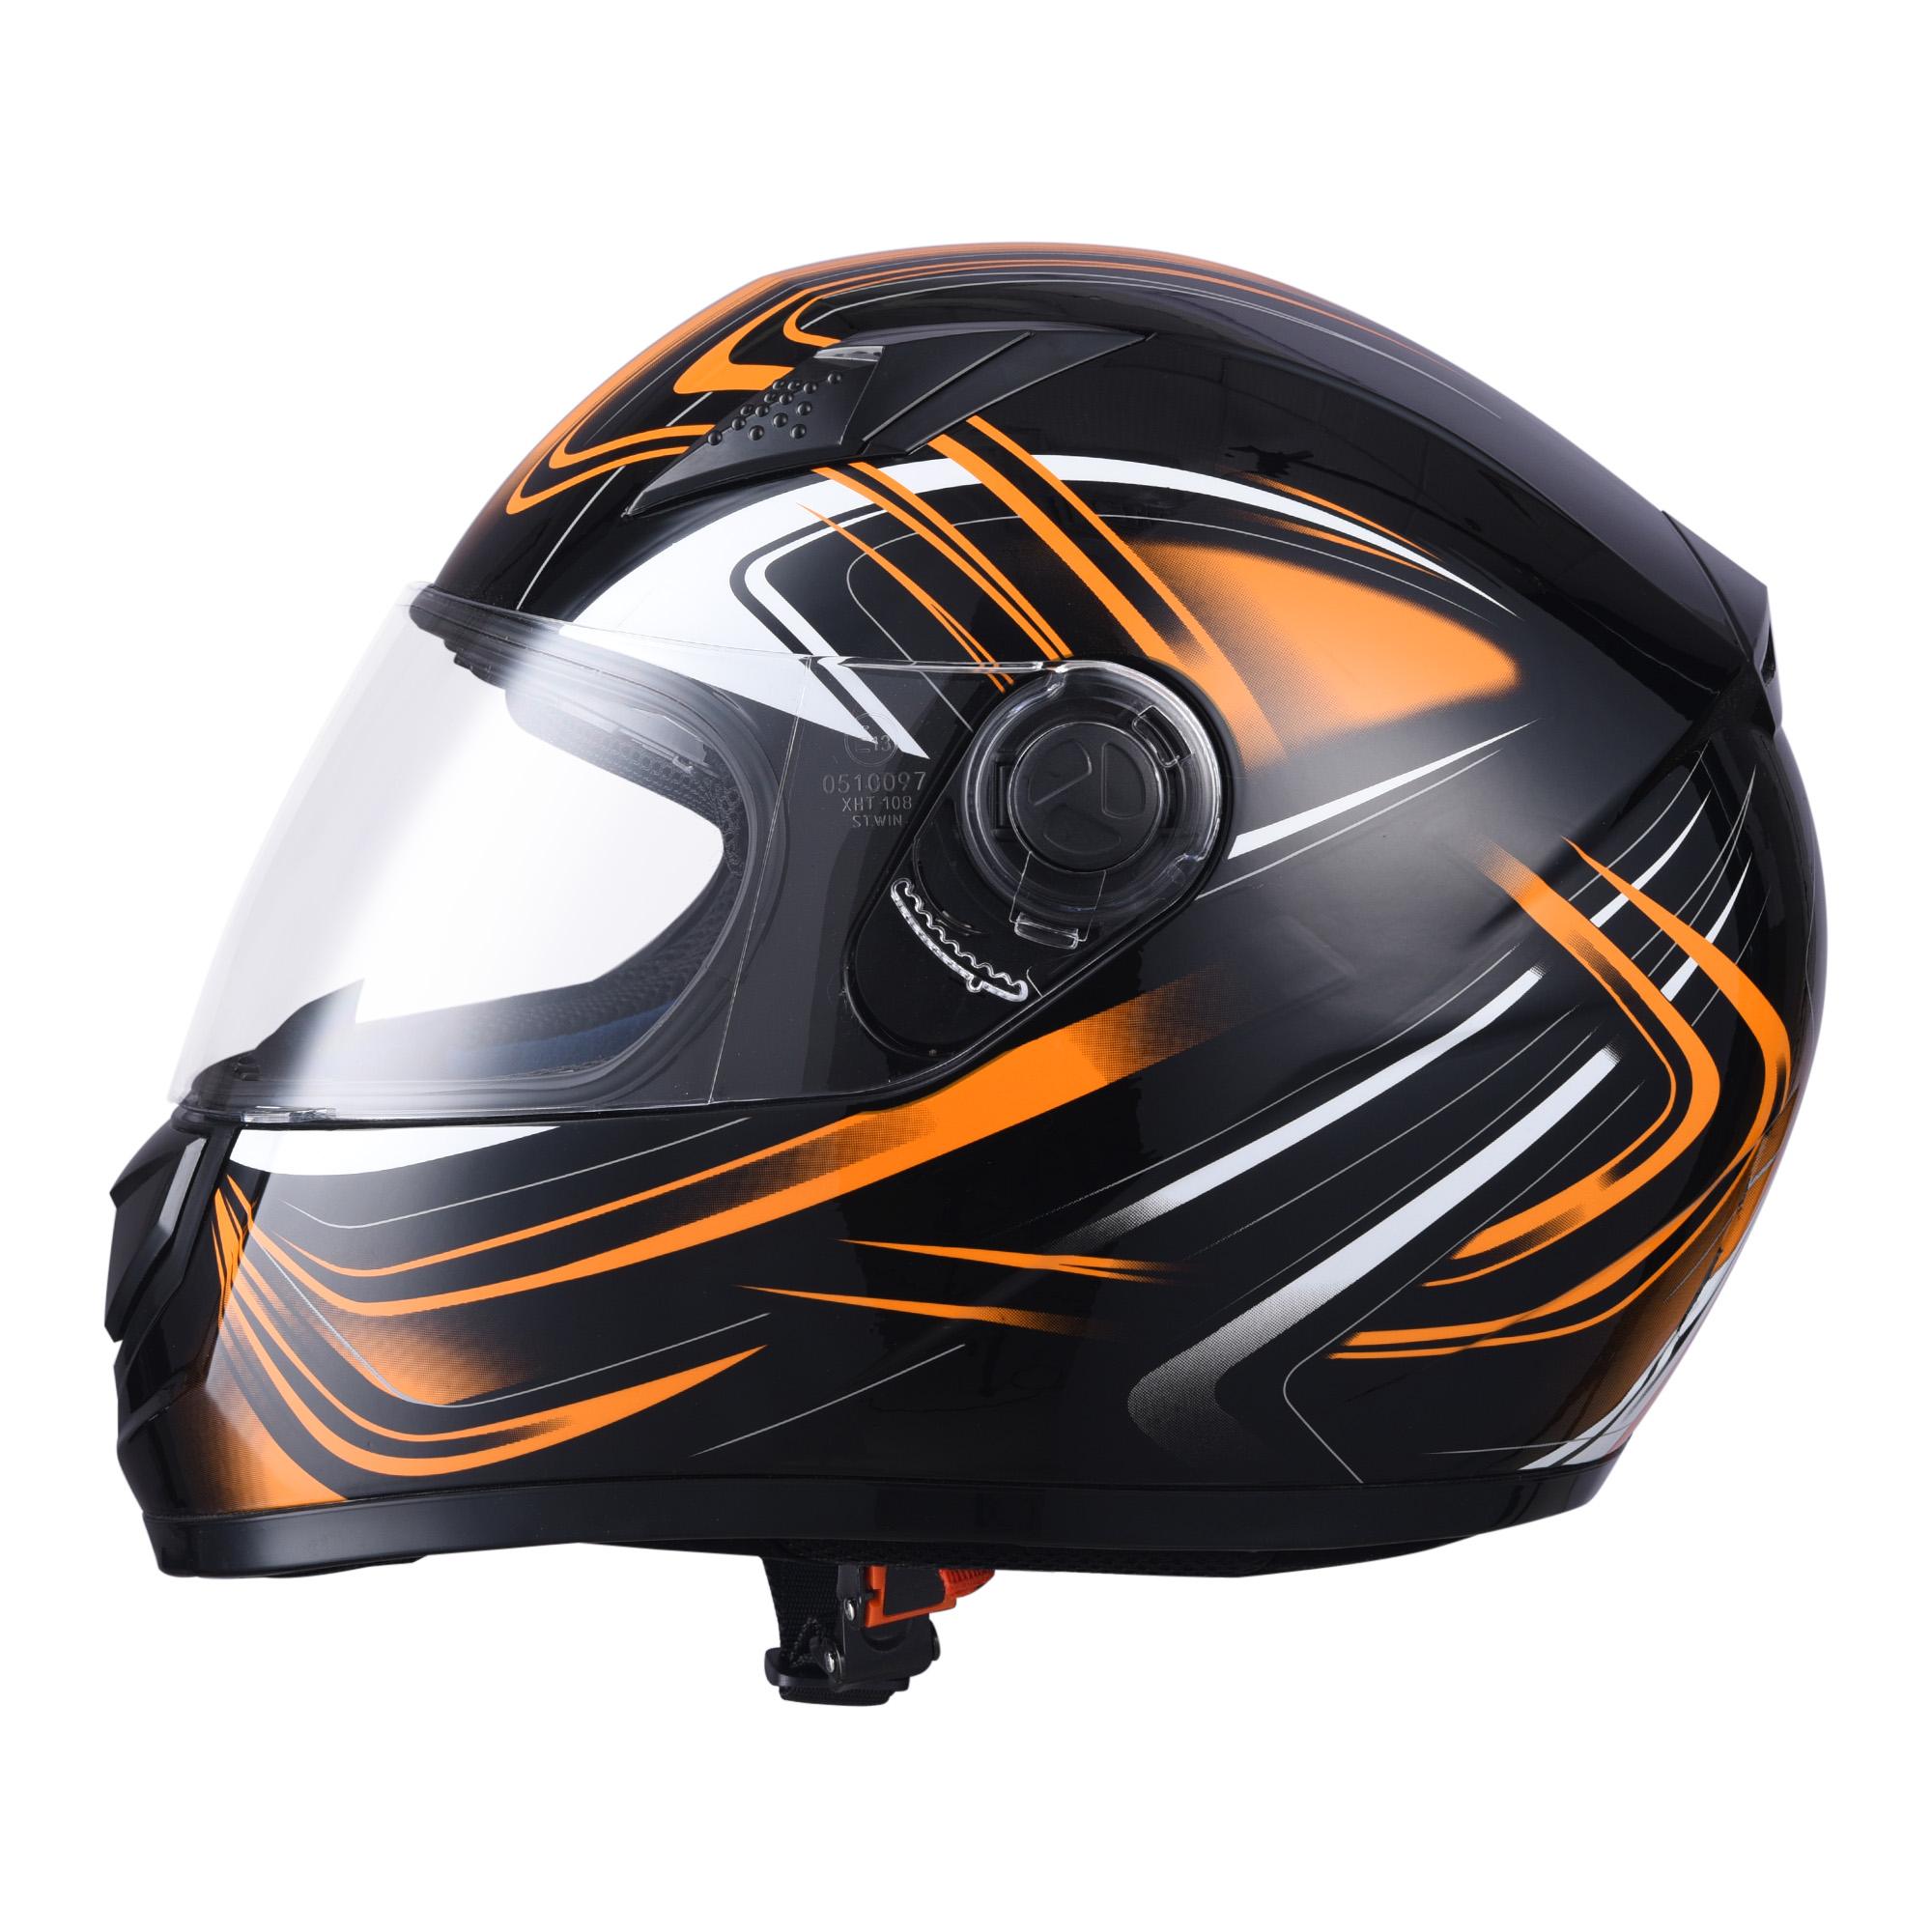 miniature 111 - AHR K12 Full Face Motorcycle Helmet DOT Air Vents Clear Visor Racing S M L XL